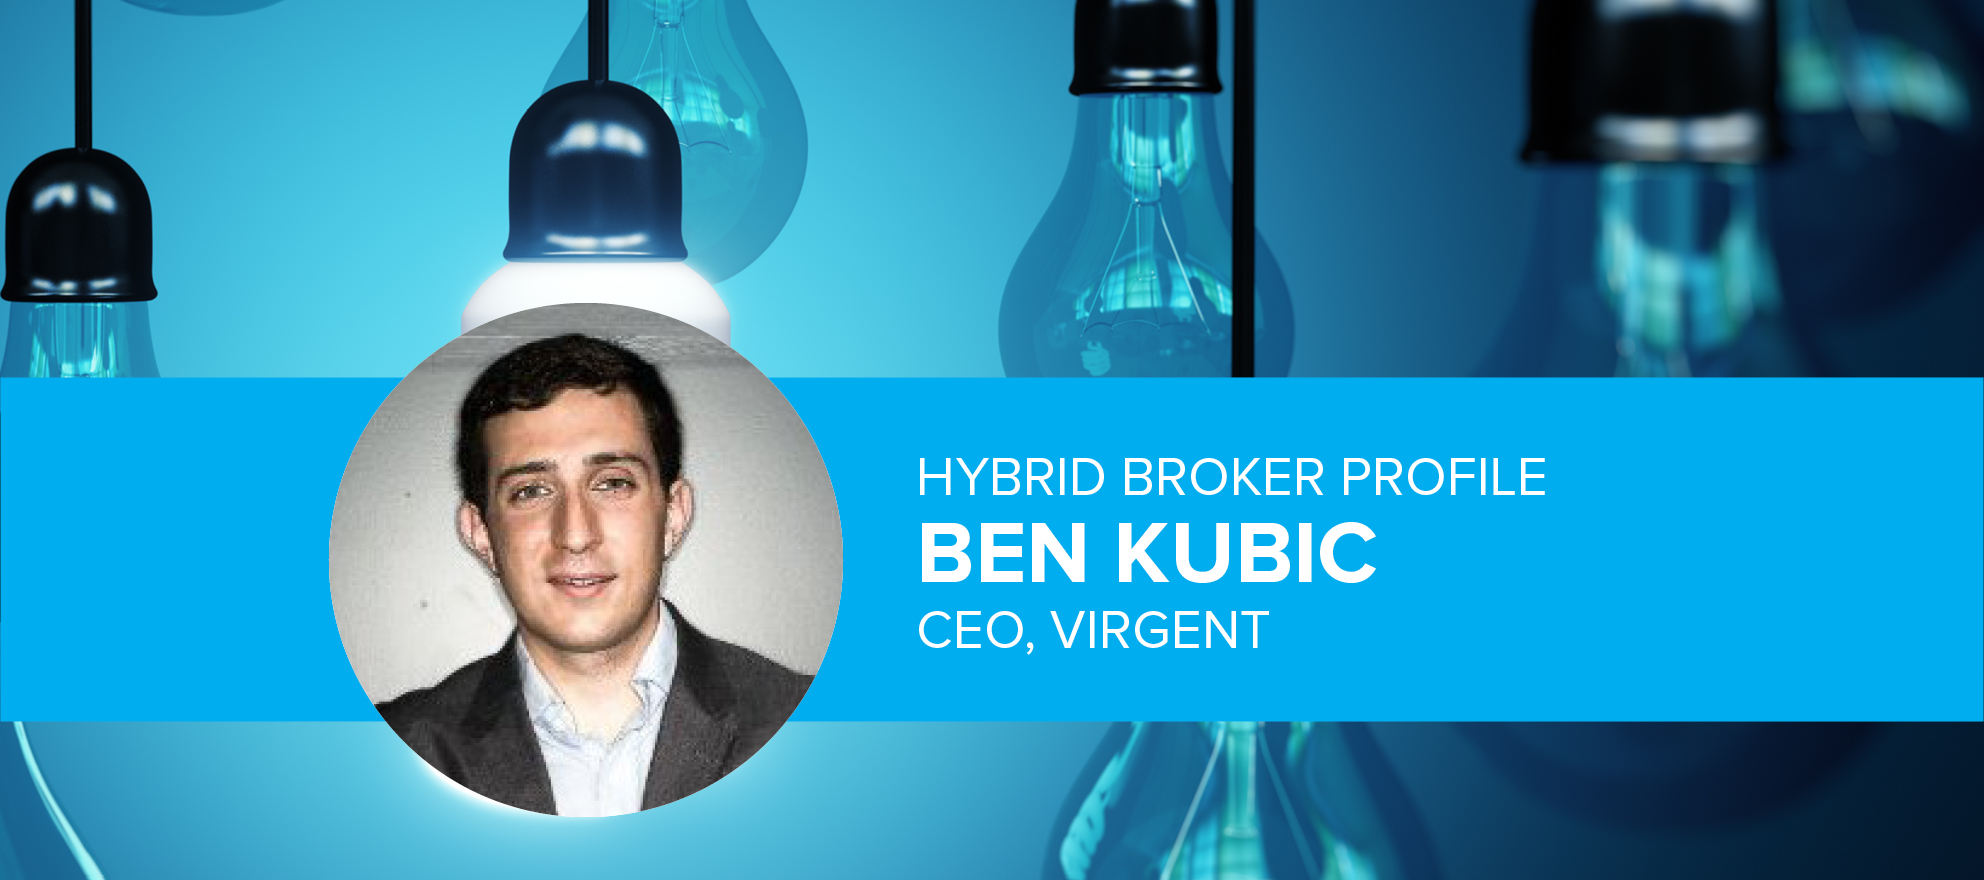 A seller-focused discount cloud brokerage: just a business plan